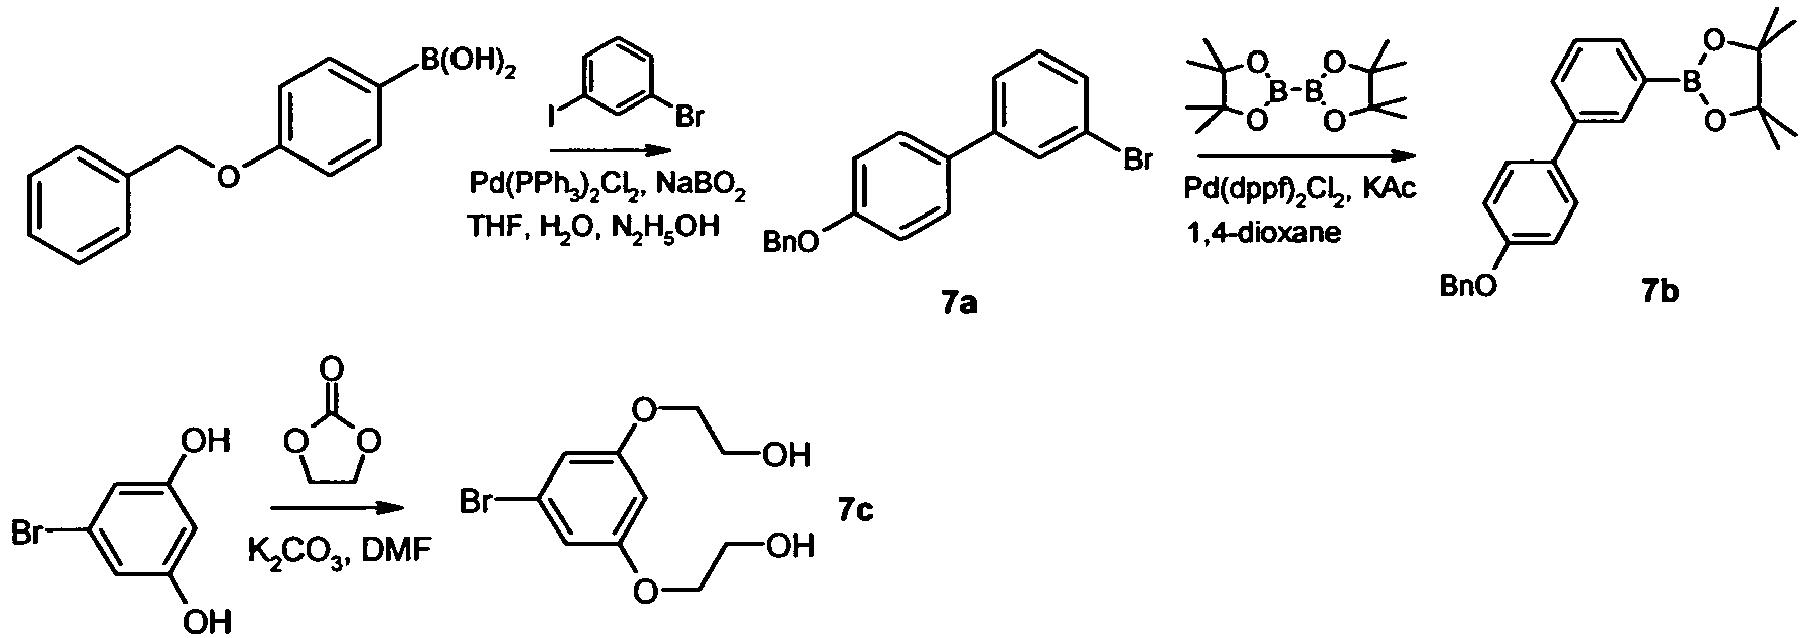 Figure imgb0719